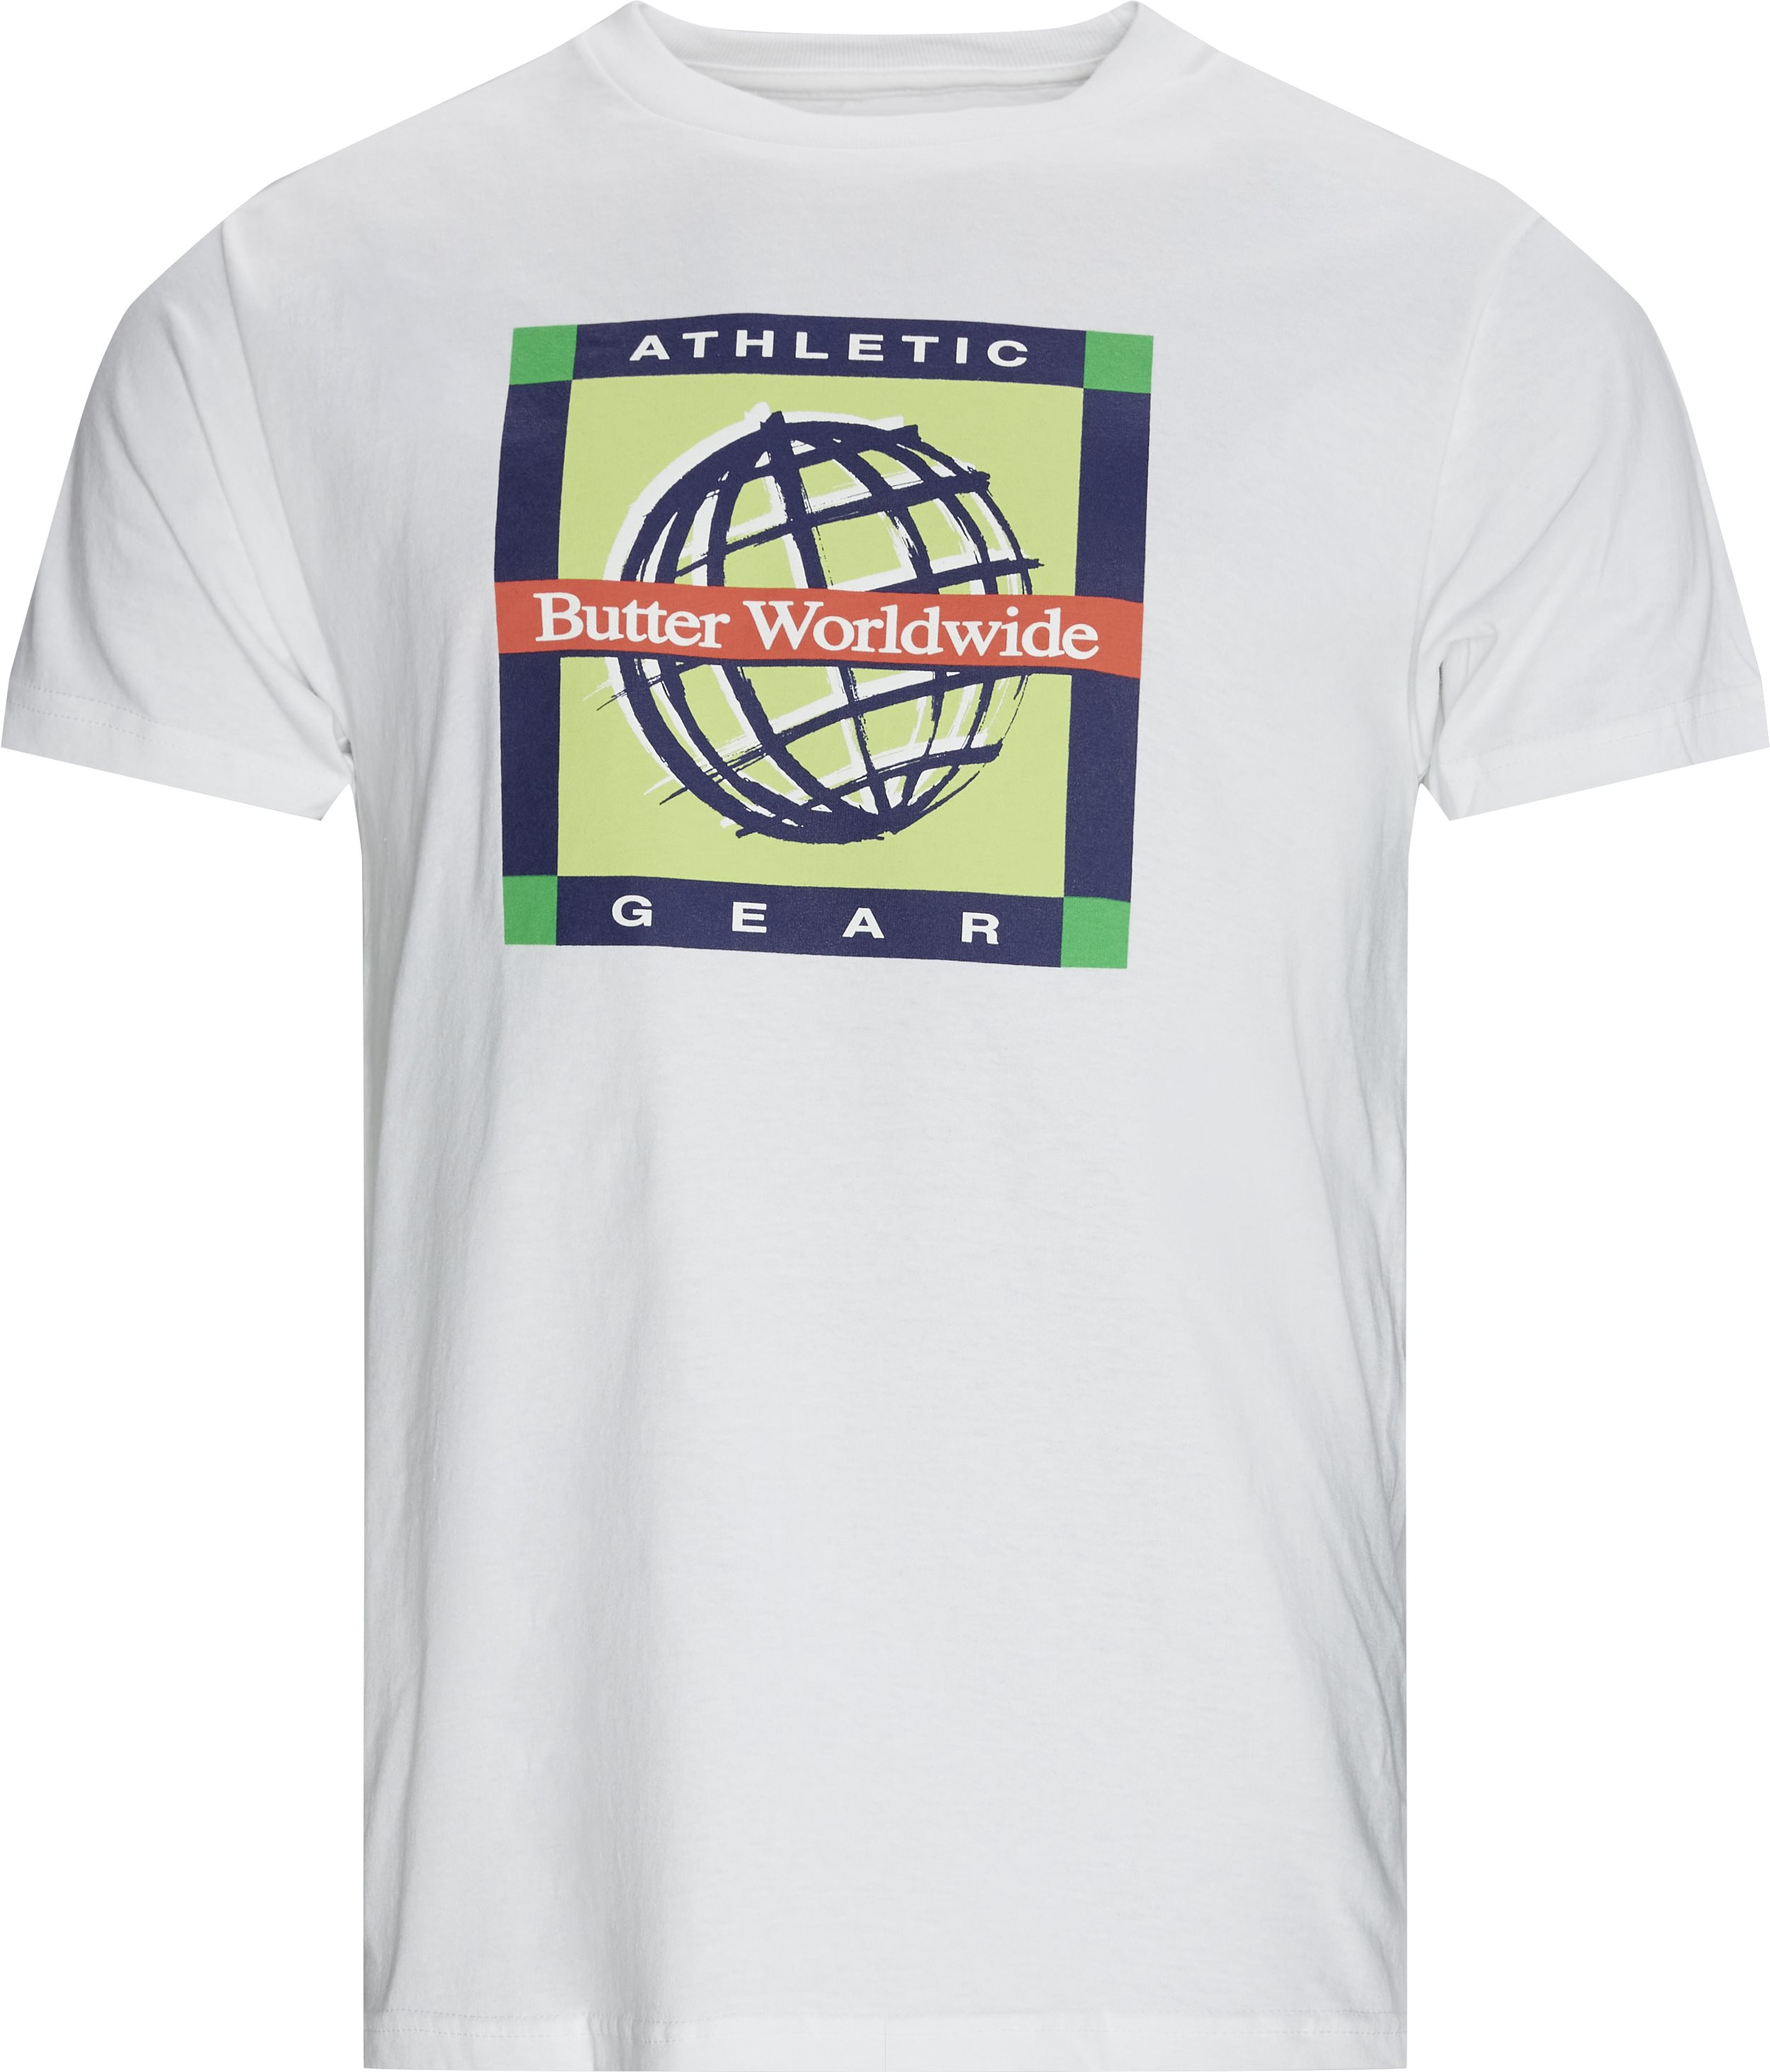 Athletic Gear Tee - T-shirts - Regular - White